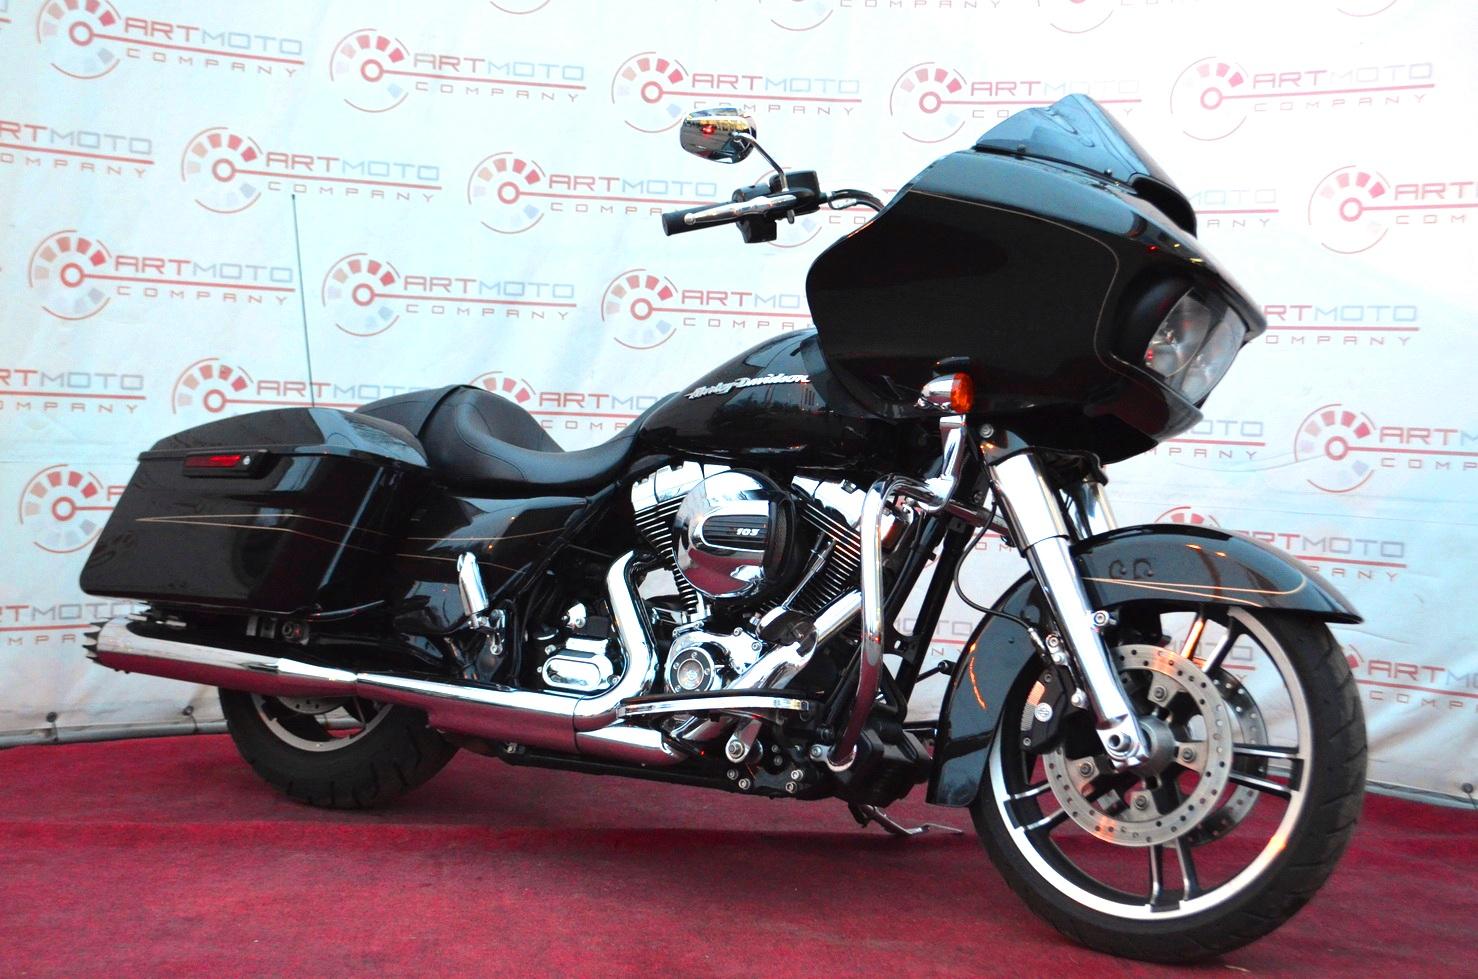 МОТОЦИКЛ HARLEY DAVIDSON FLTRXS ROAD GLIDE 2016  Артмото - купить квадроцикл в украине и харькове, мотоцикл, снегоход, скутер, мопед, электромобиль